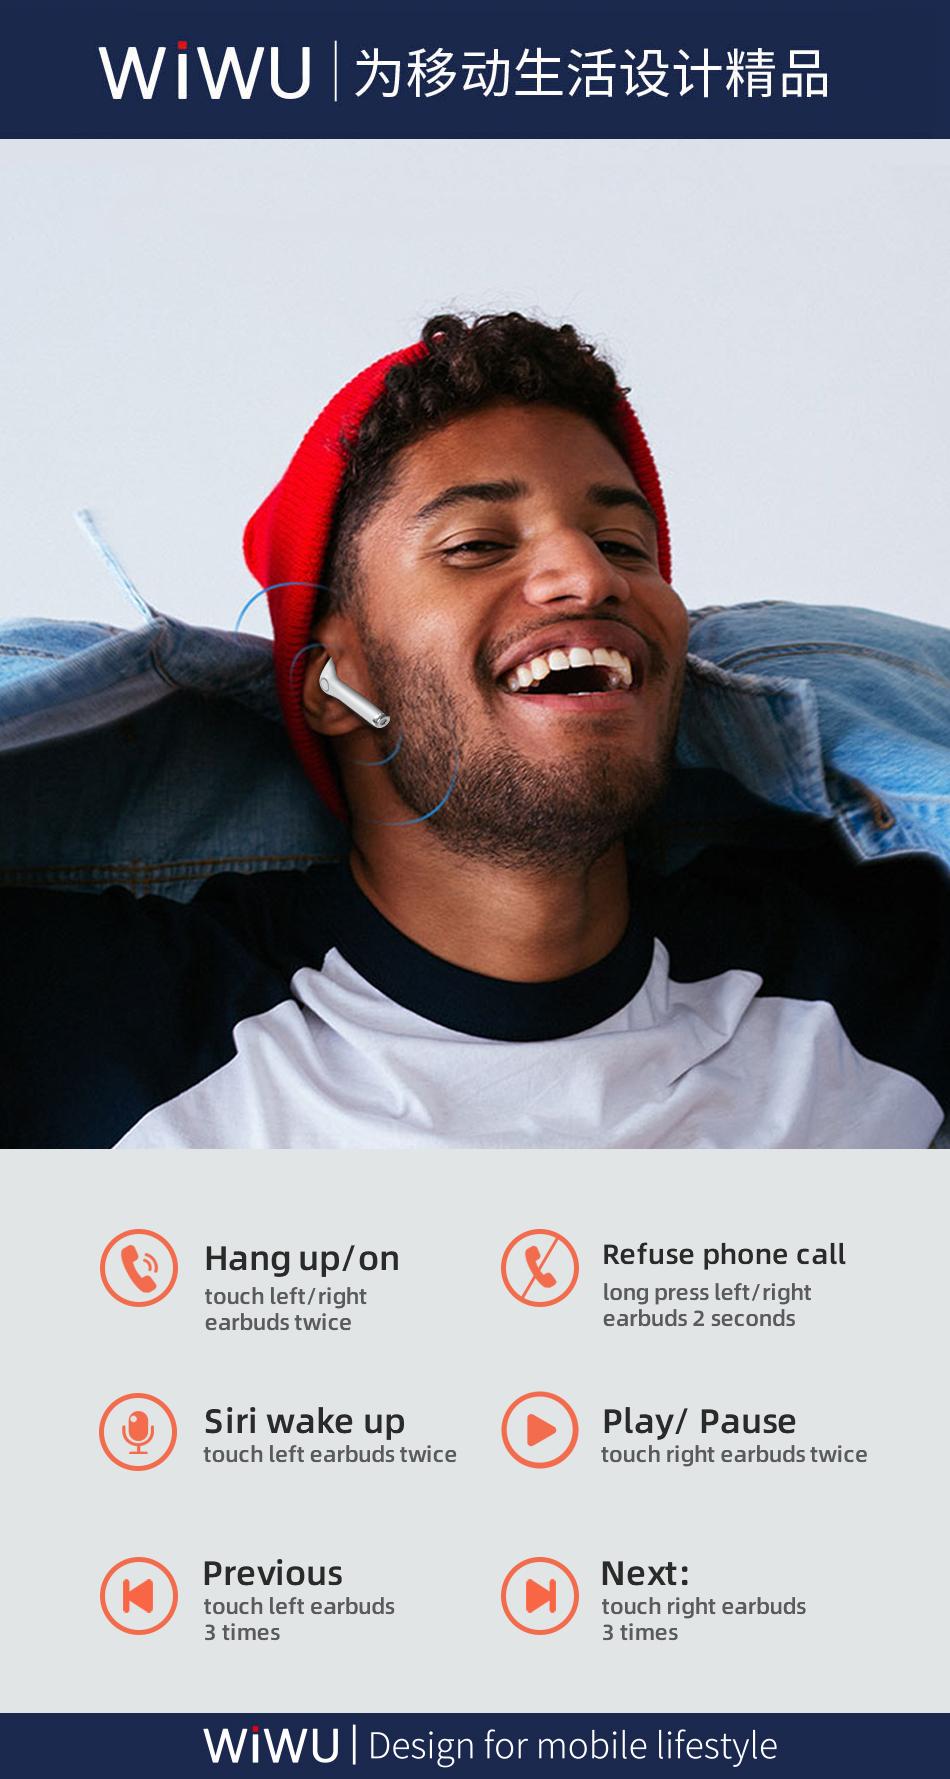 WiWU TWS06真无线双耳 蓝牙耳机 (https://www.wiwu.net.cn/) 耳机 第4张